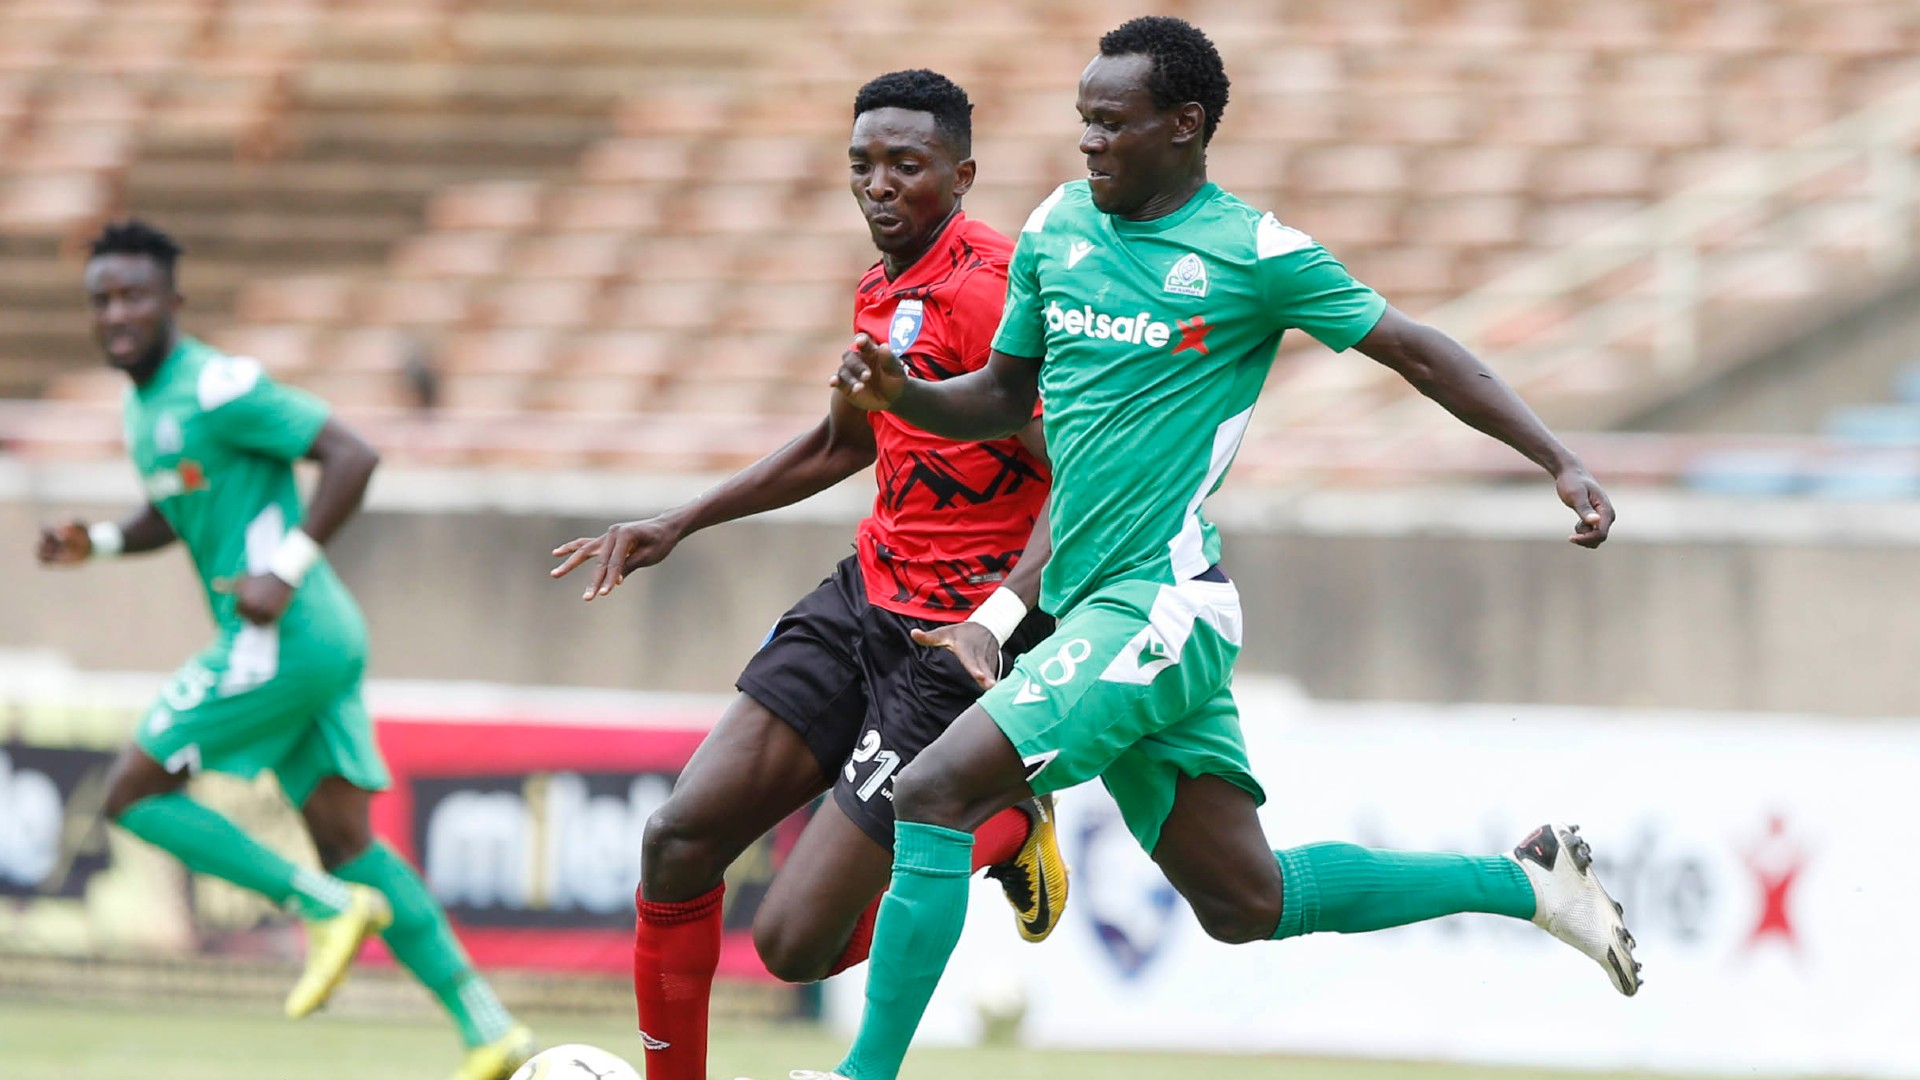 Mashemeji Derby: Sserunkuma brace and memorable moments in AFC Leopards, Gor Mahia meetings